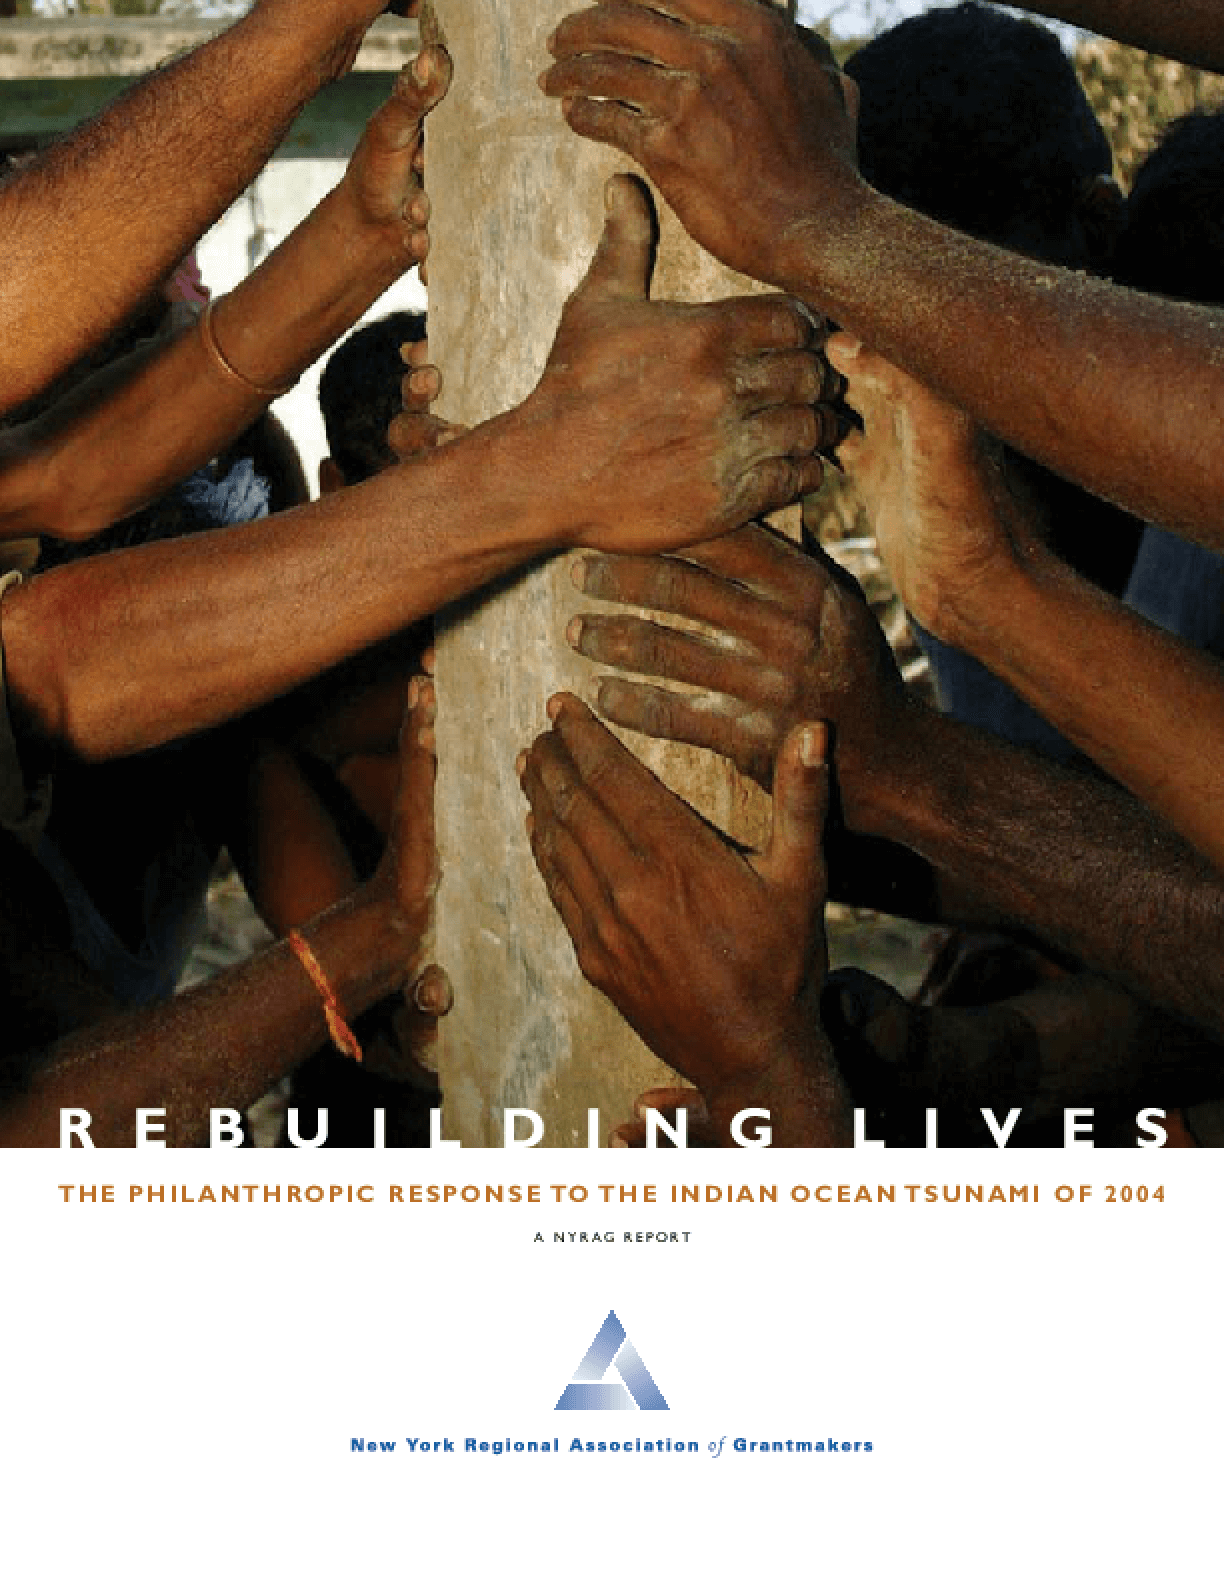 Rebuilding Lives: The Philanthropic Response to the Indian Ocean Tsunami of 2004